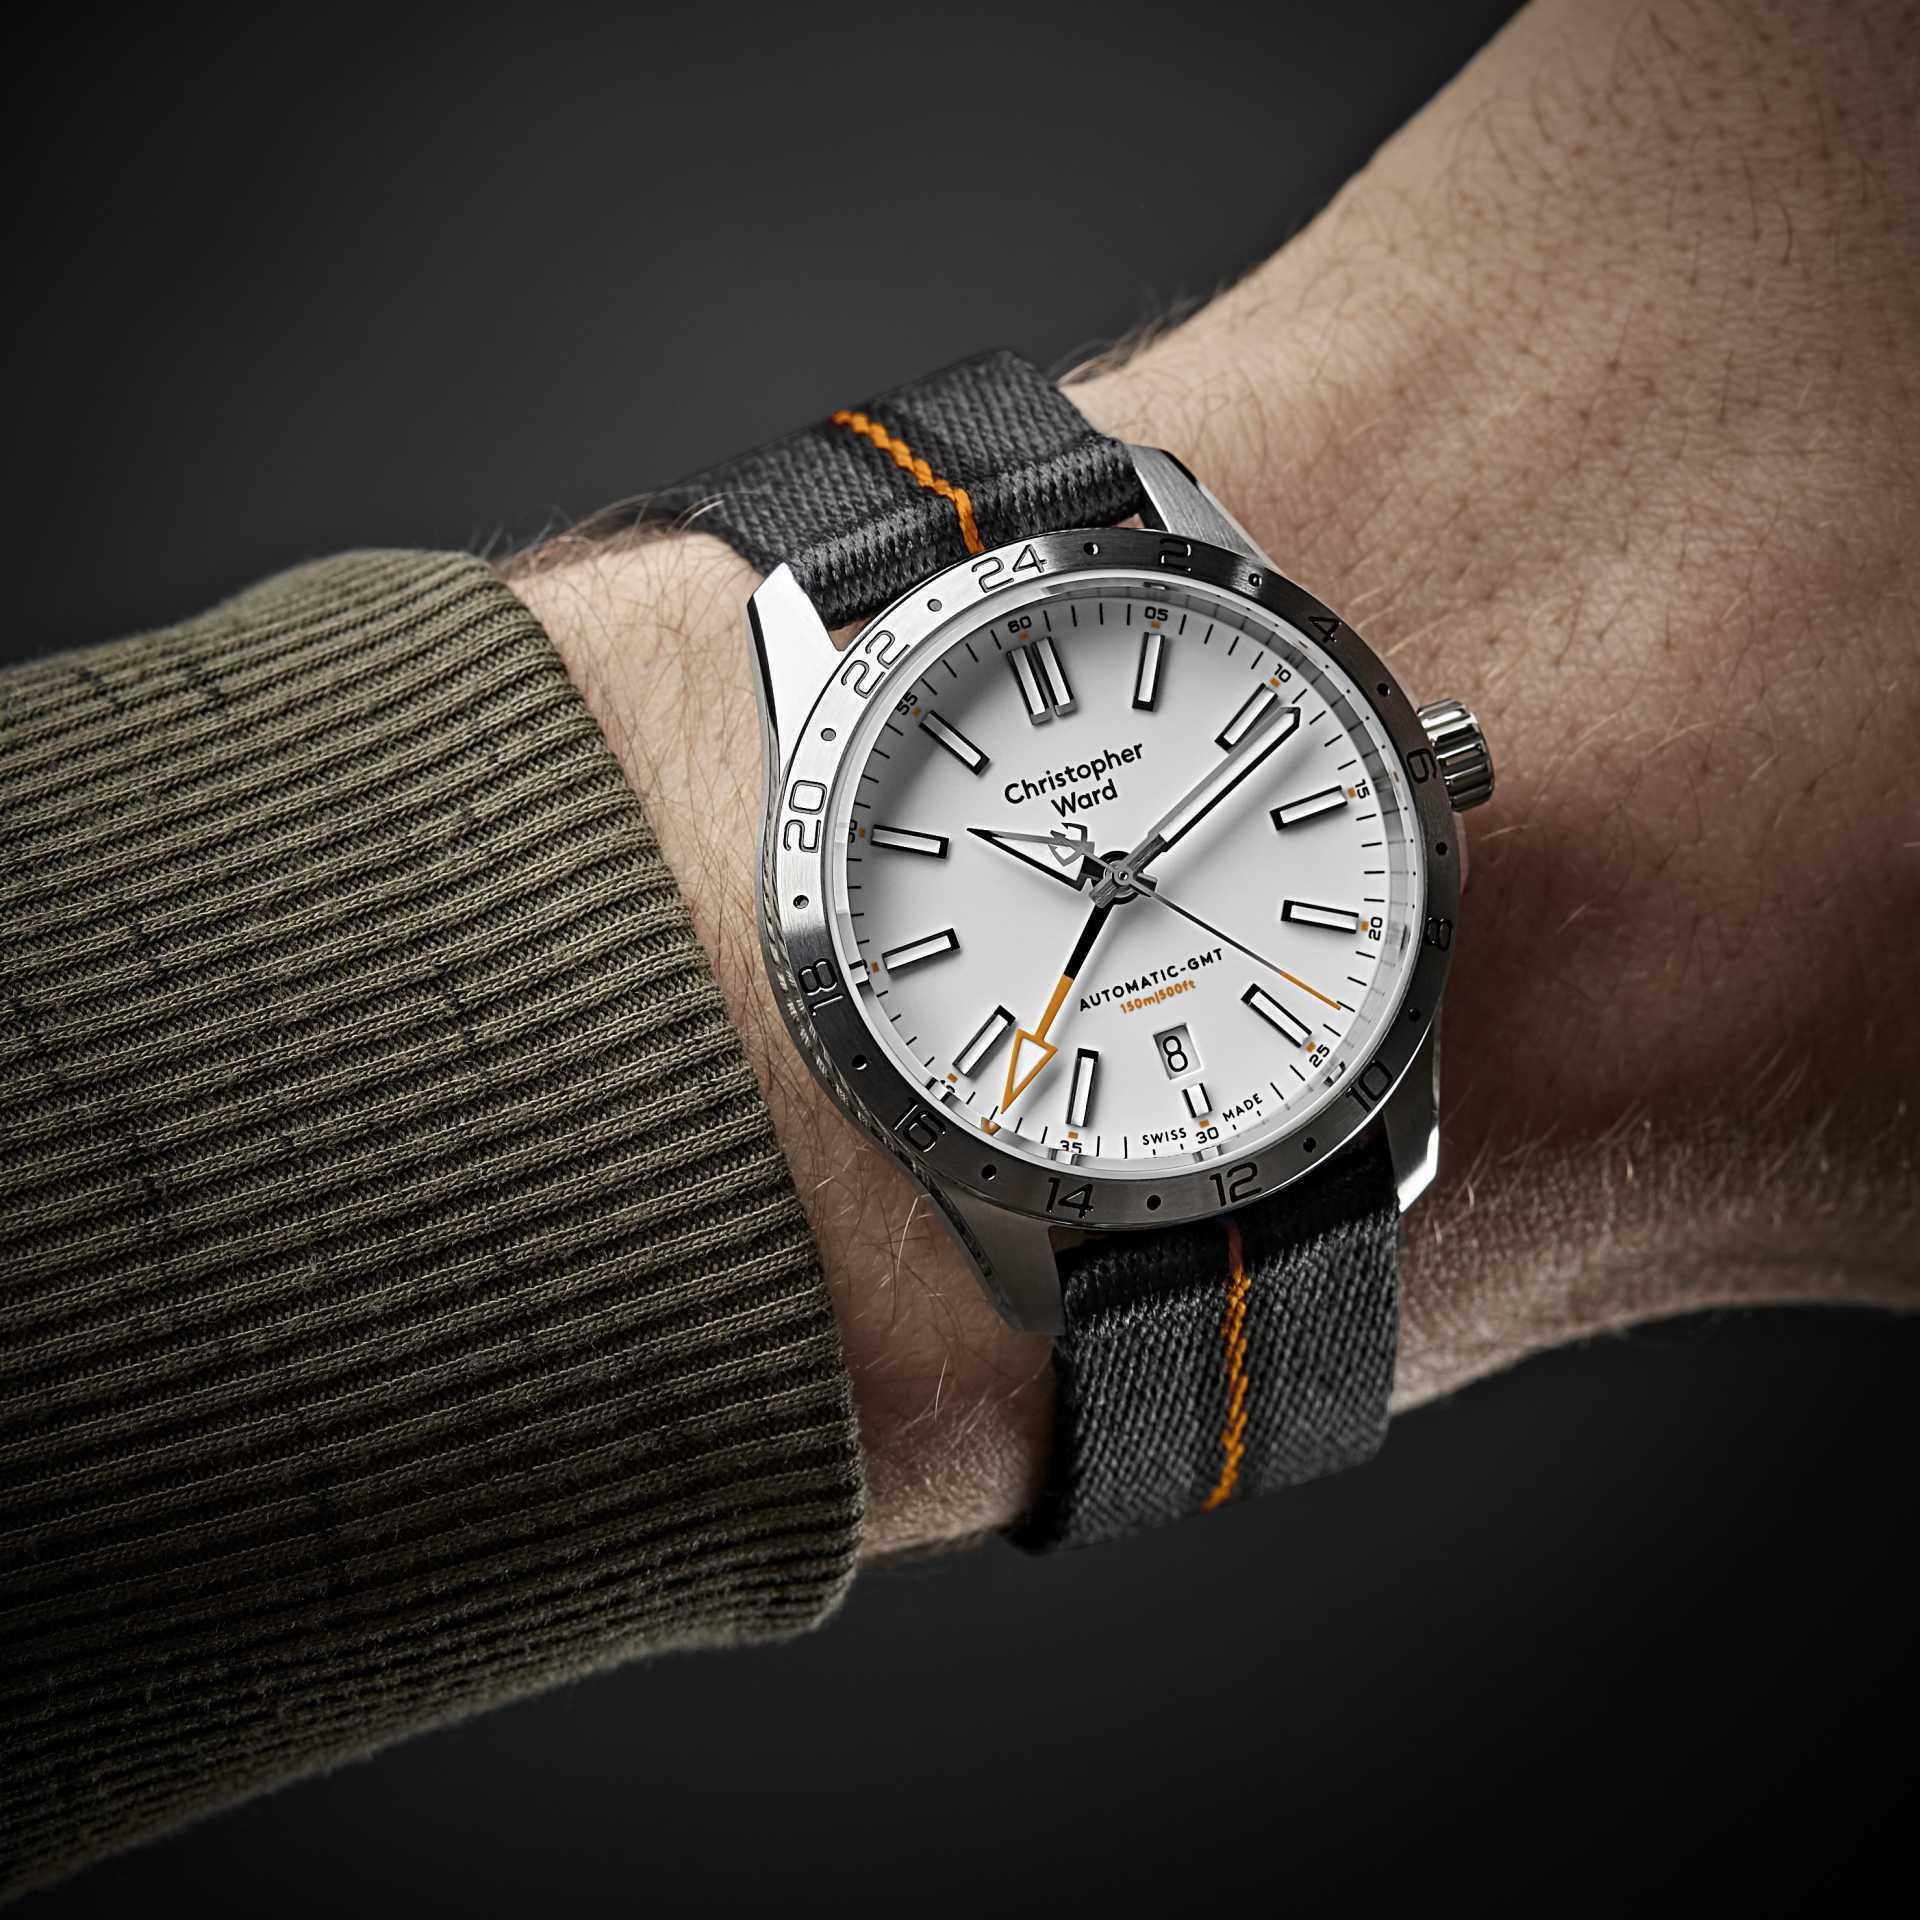 The Christopher Ward C63 Sealander GMT